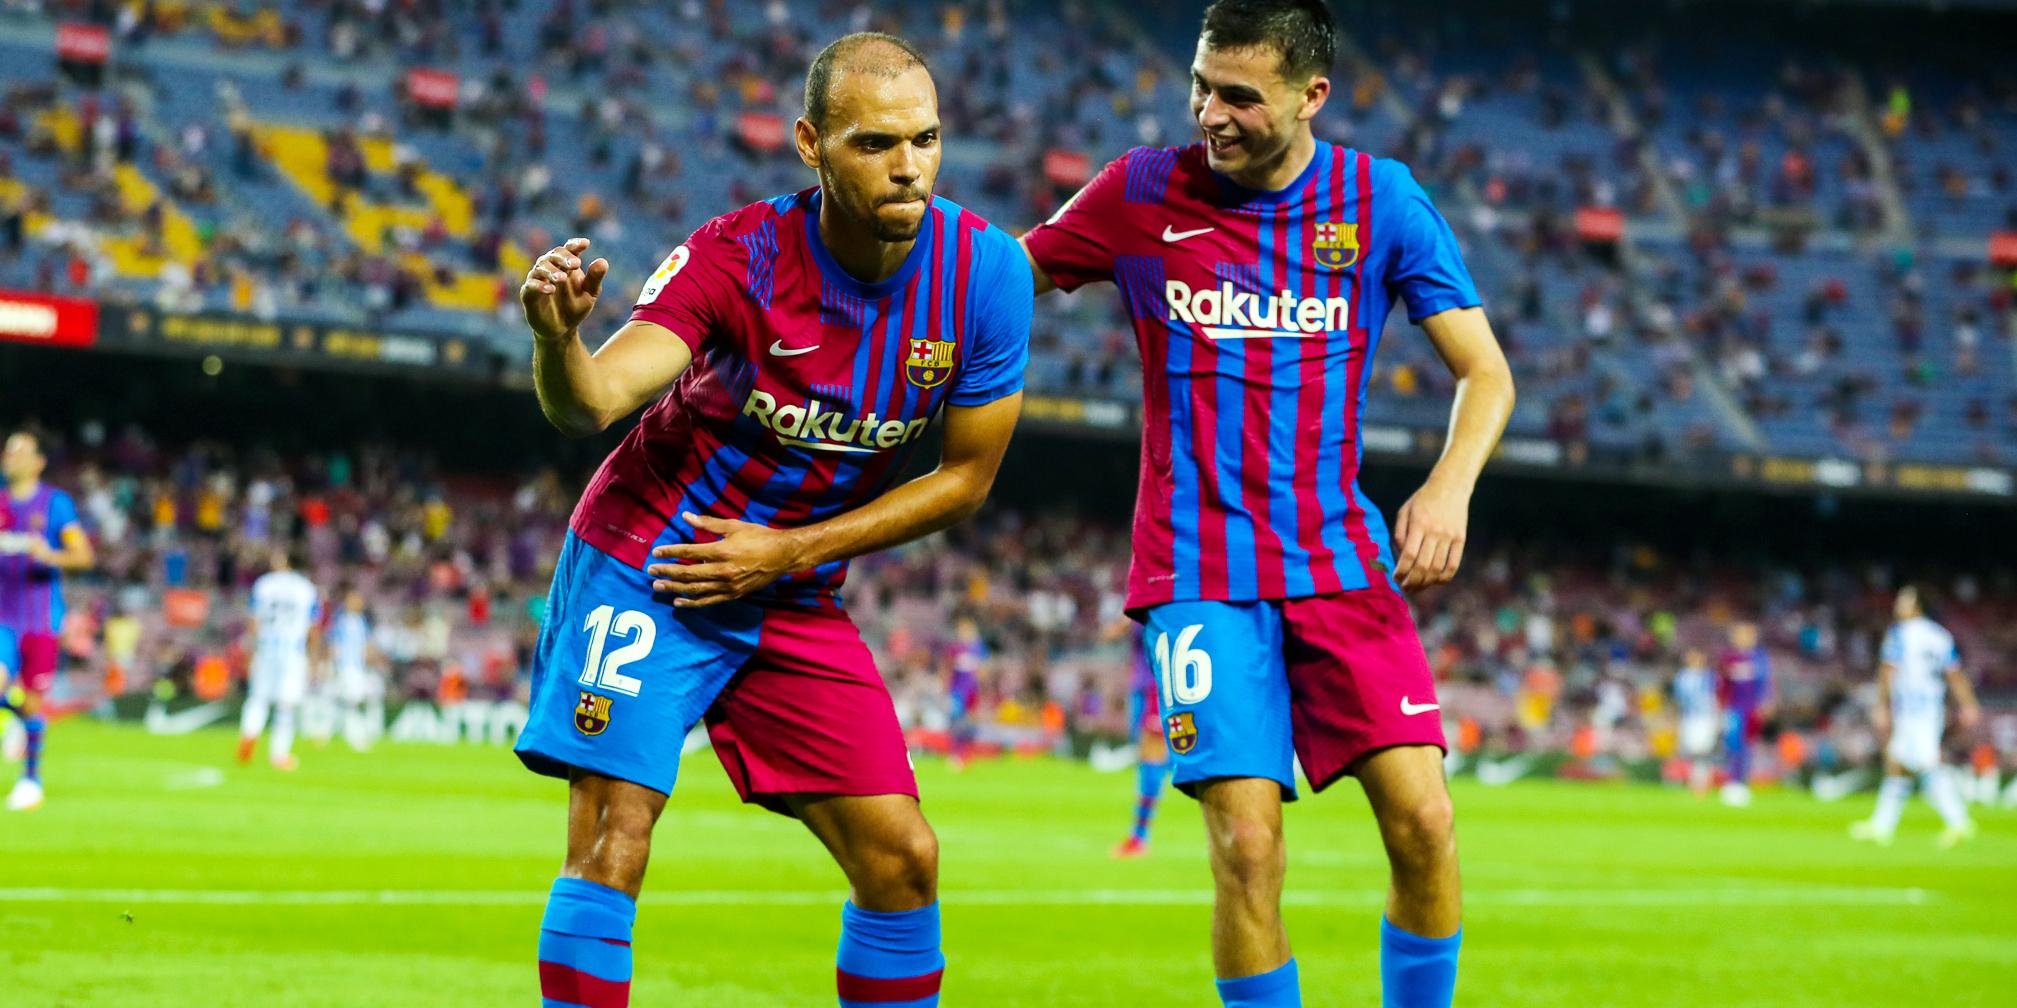 Braithwaite celebra un gol | FC Barcelona